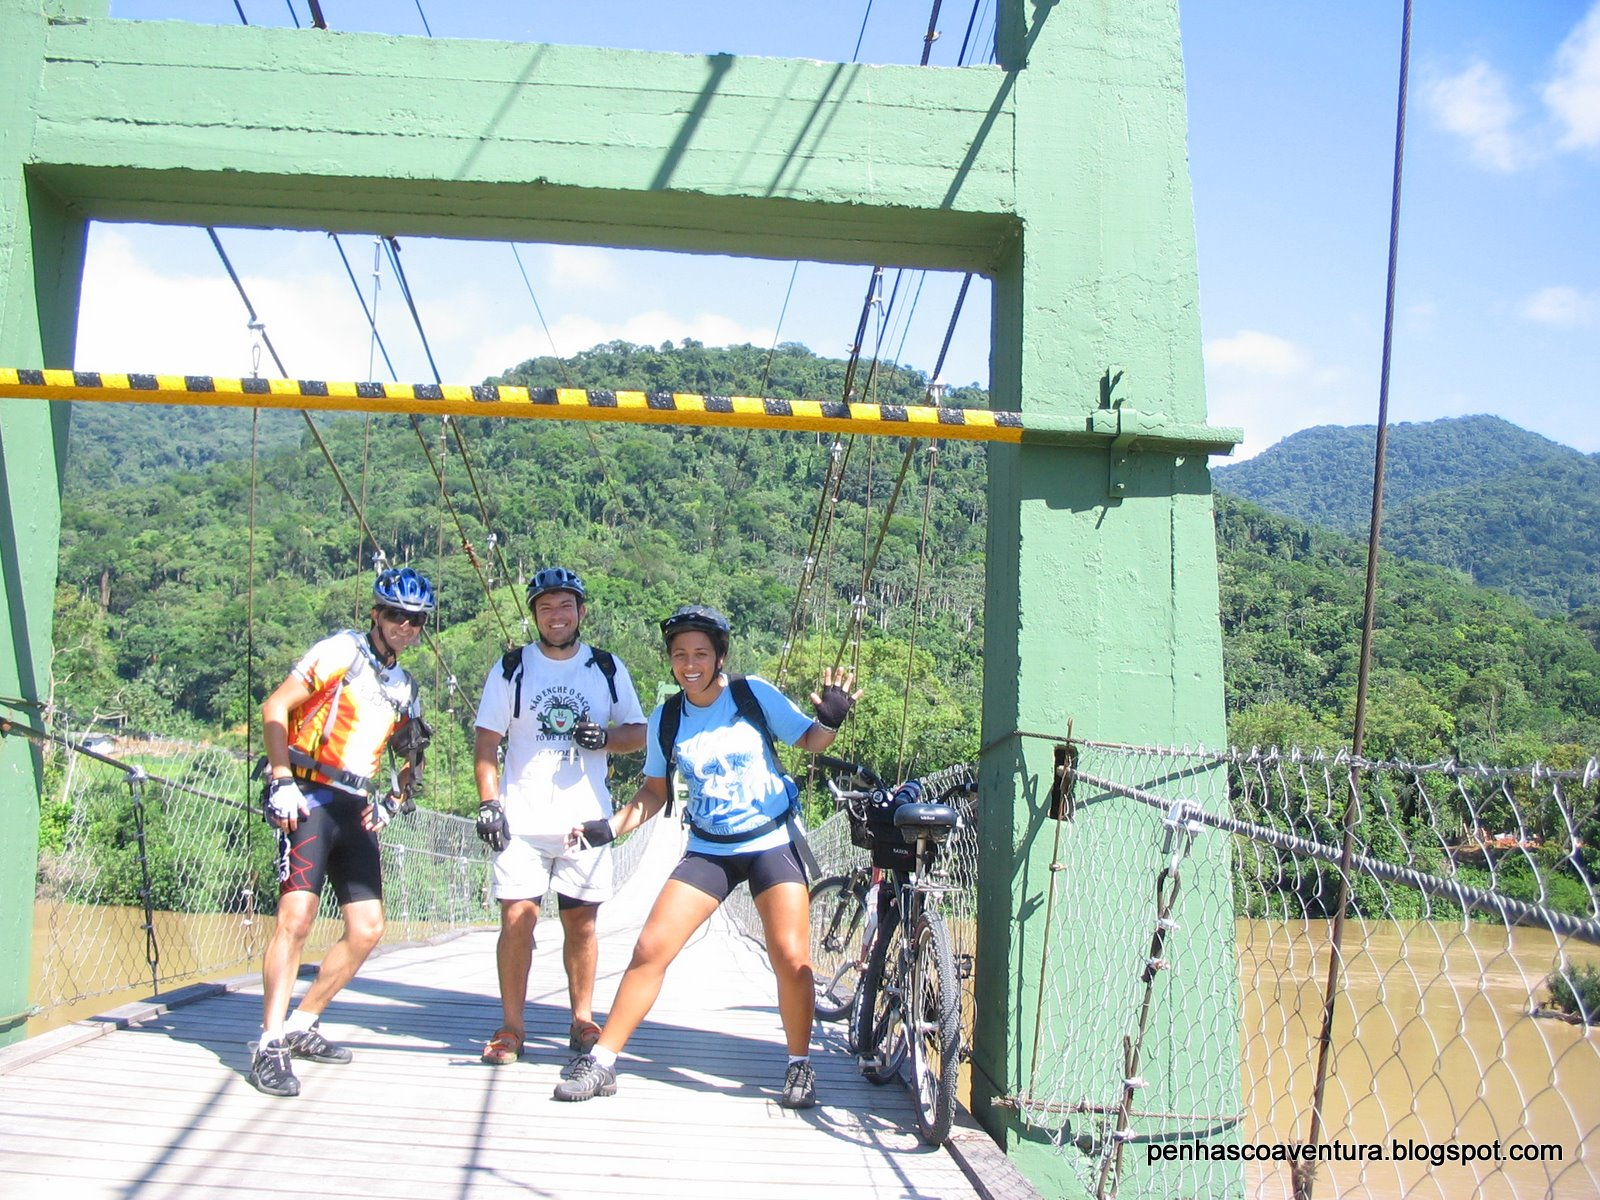 Circuito Vale Europeu : Maumau ecos aventura dia circuito vale europeu indaial sc a